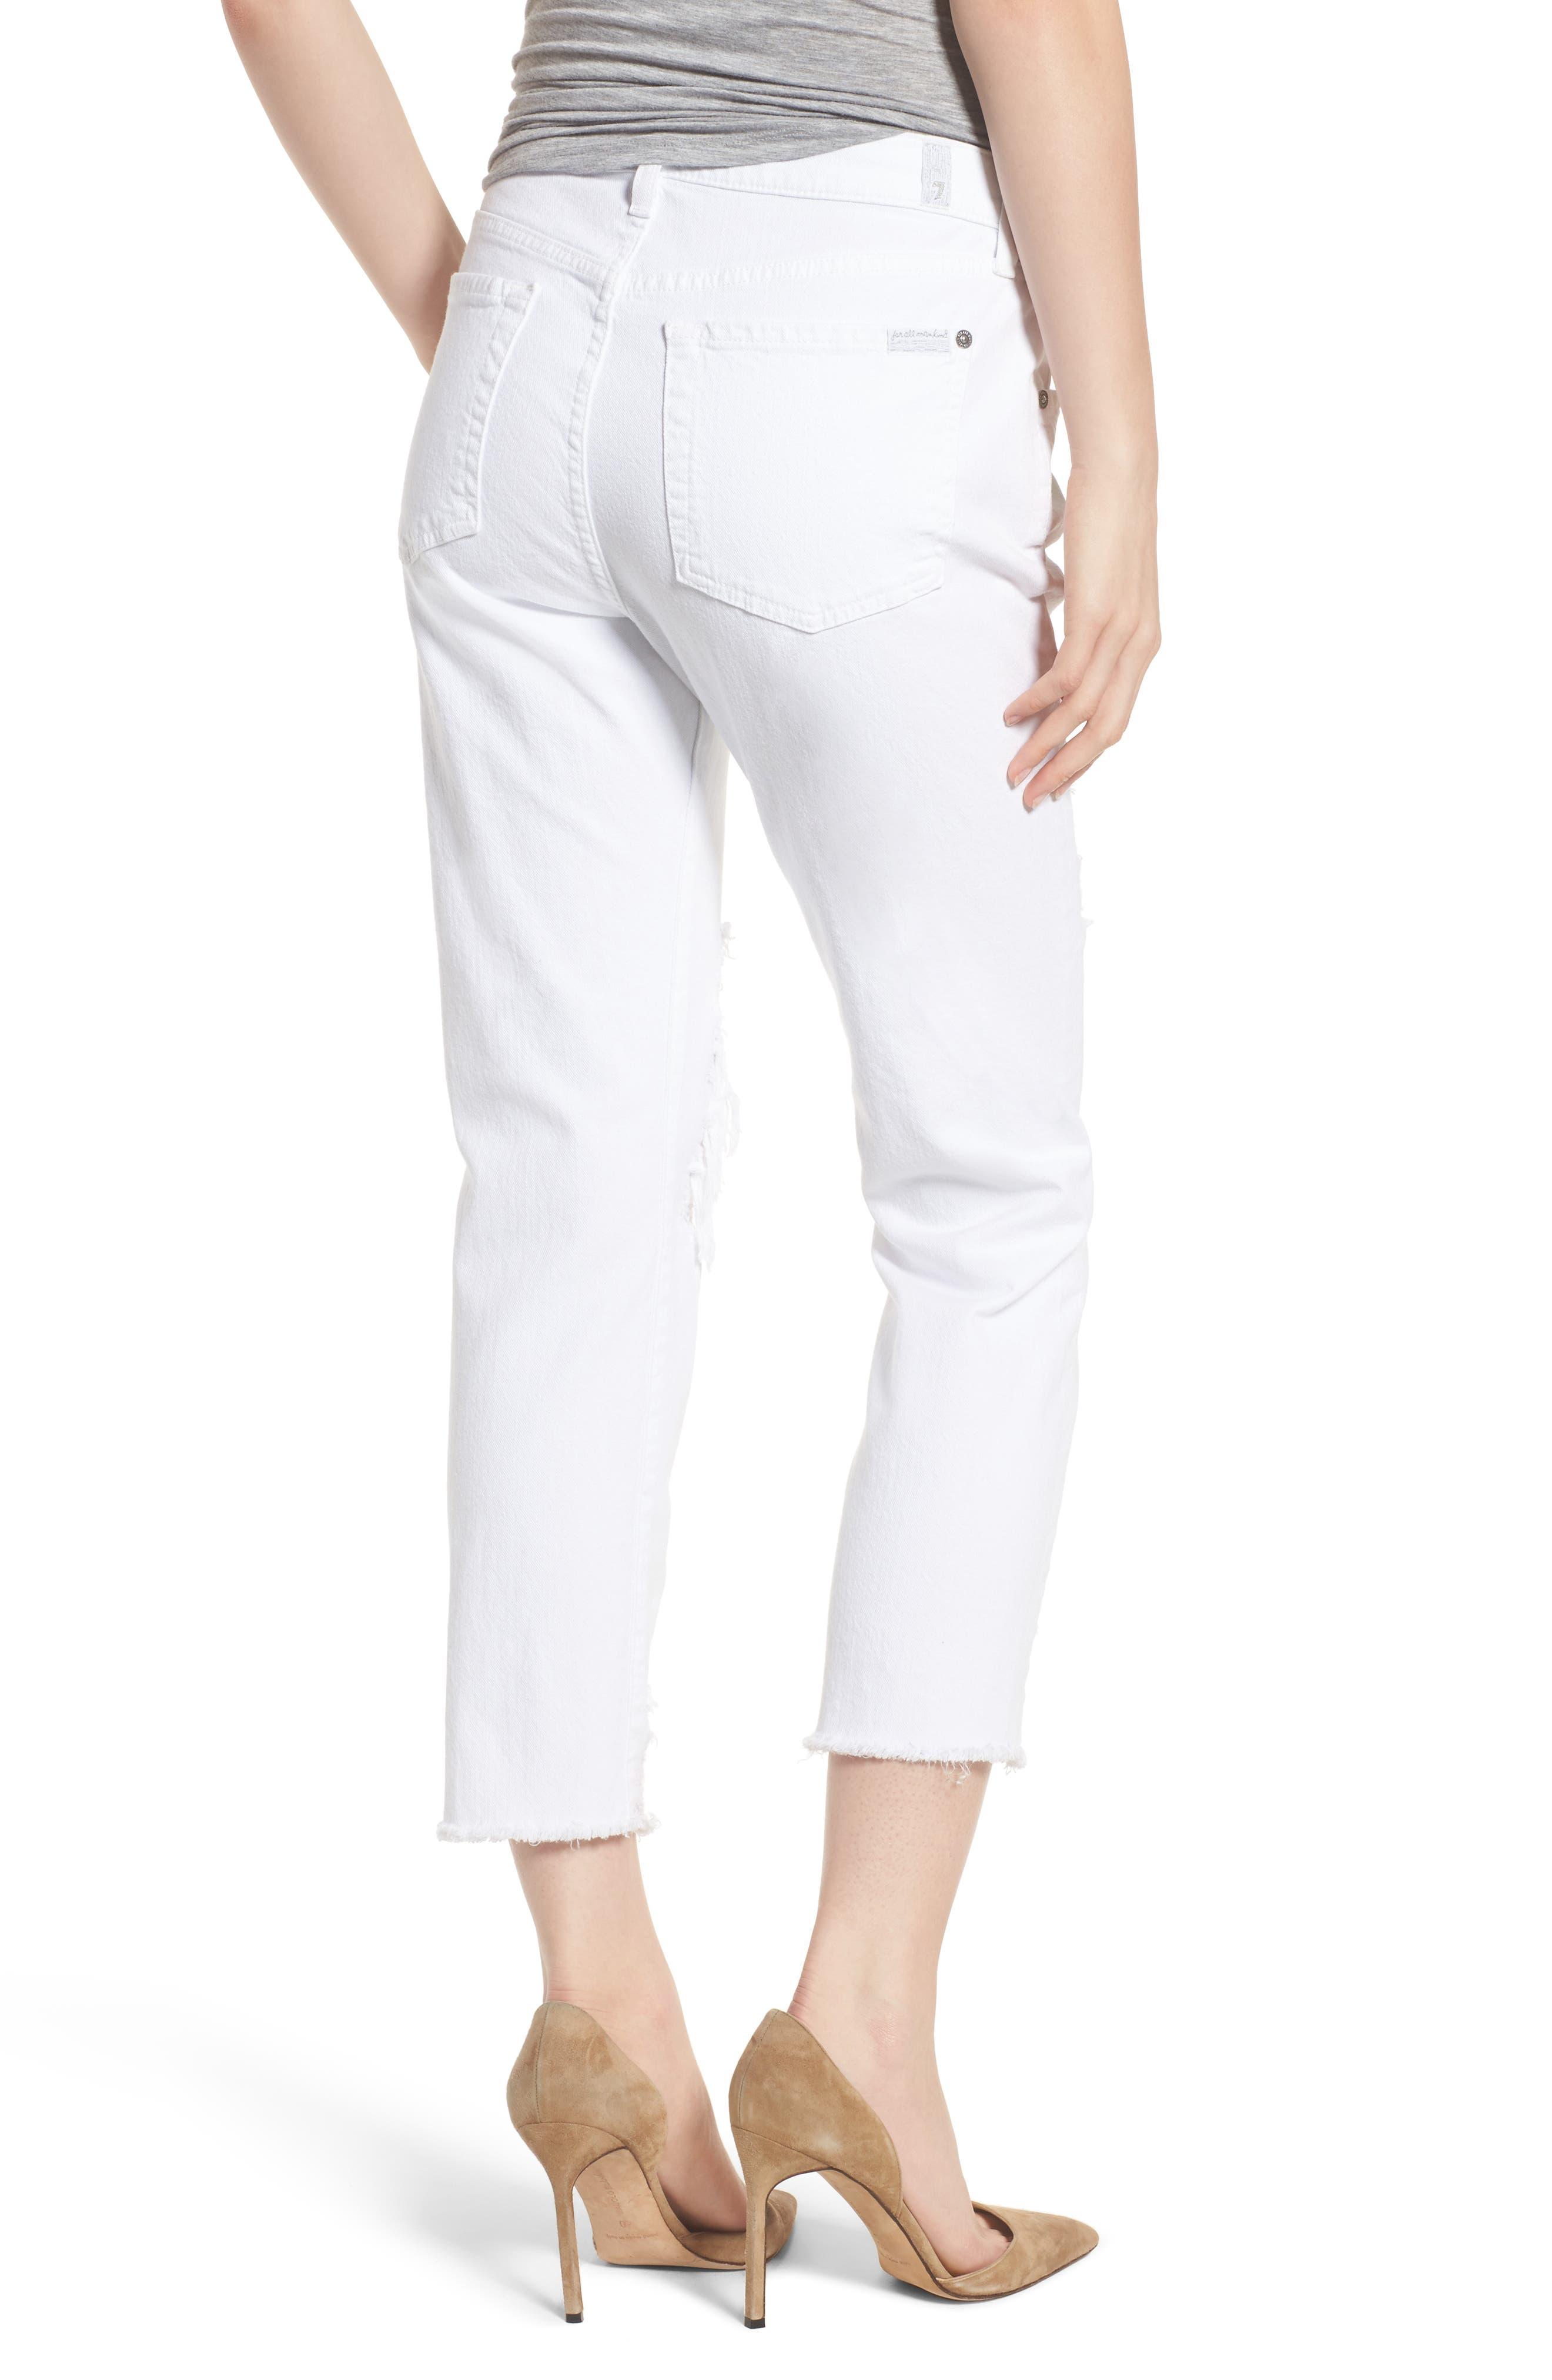 Josefina High Waist Boyfriend Jeans,                             Alternate thumbnail 2, color,                             White Fashion 2